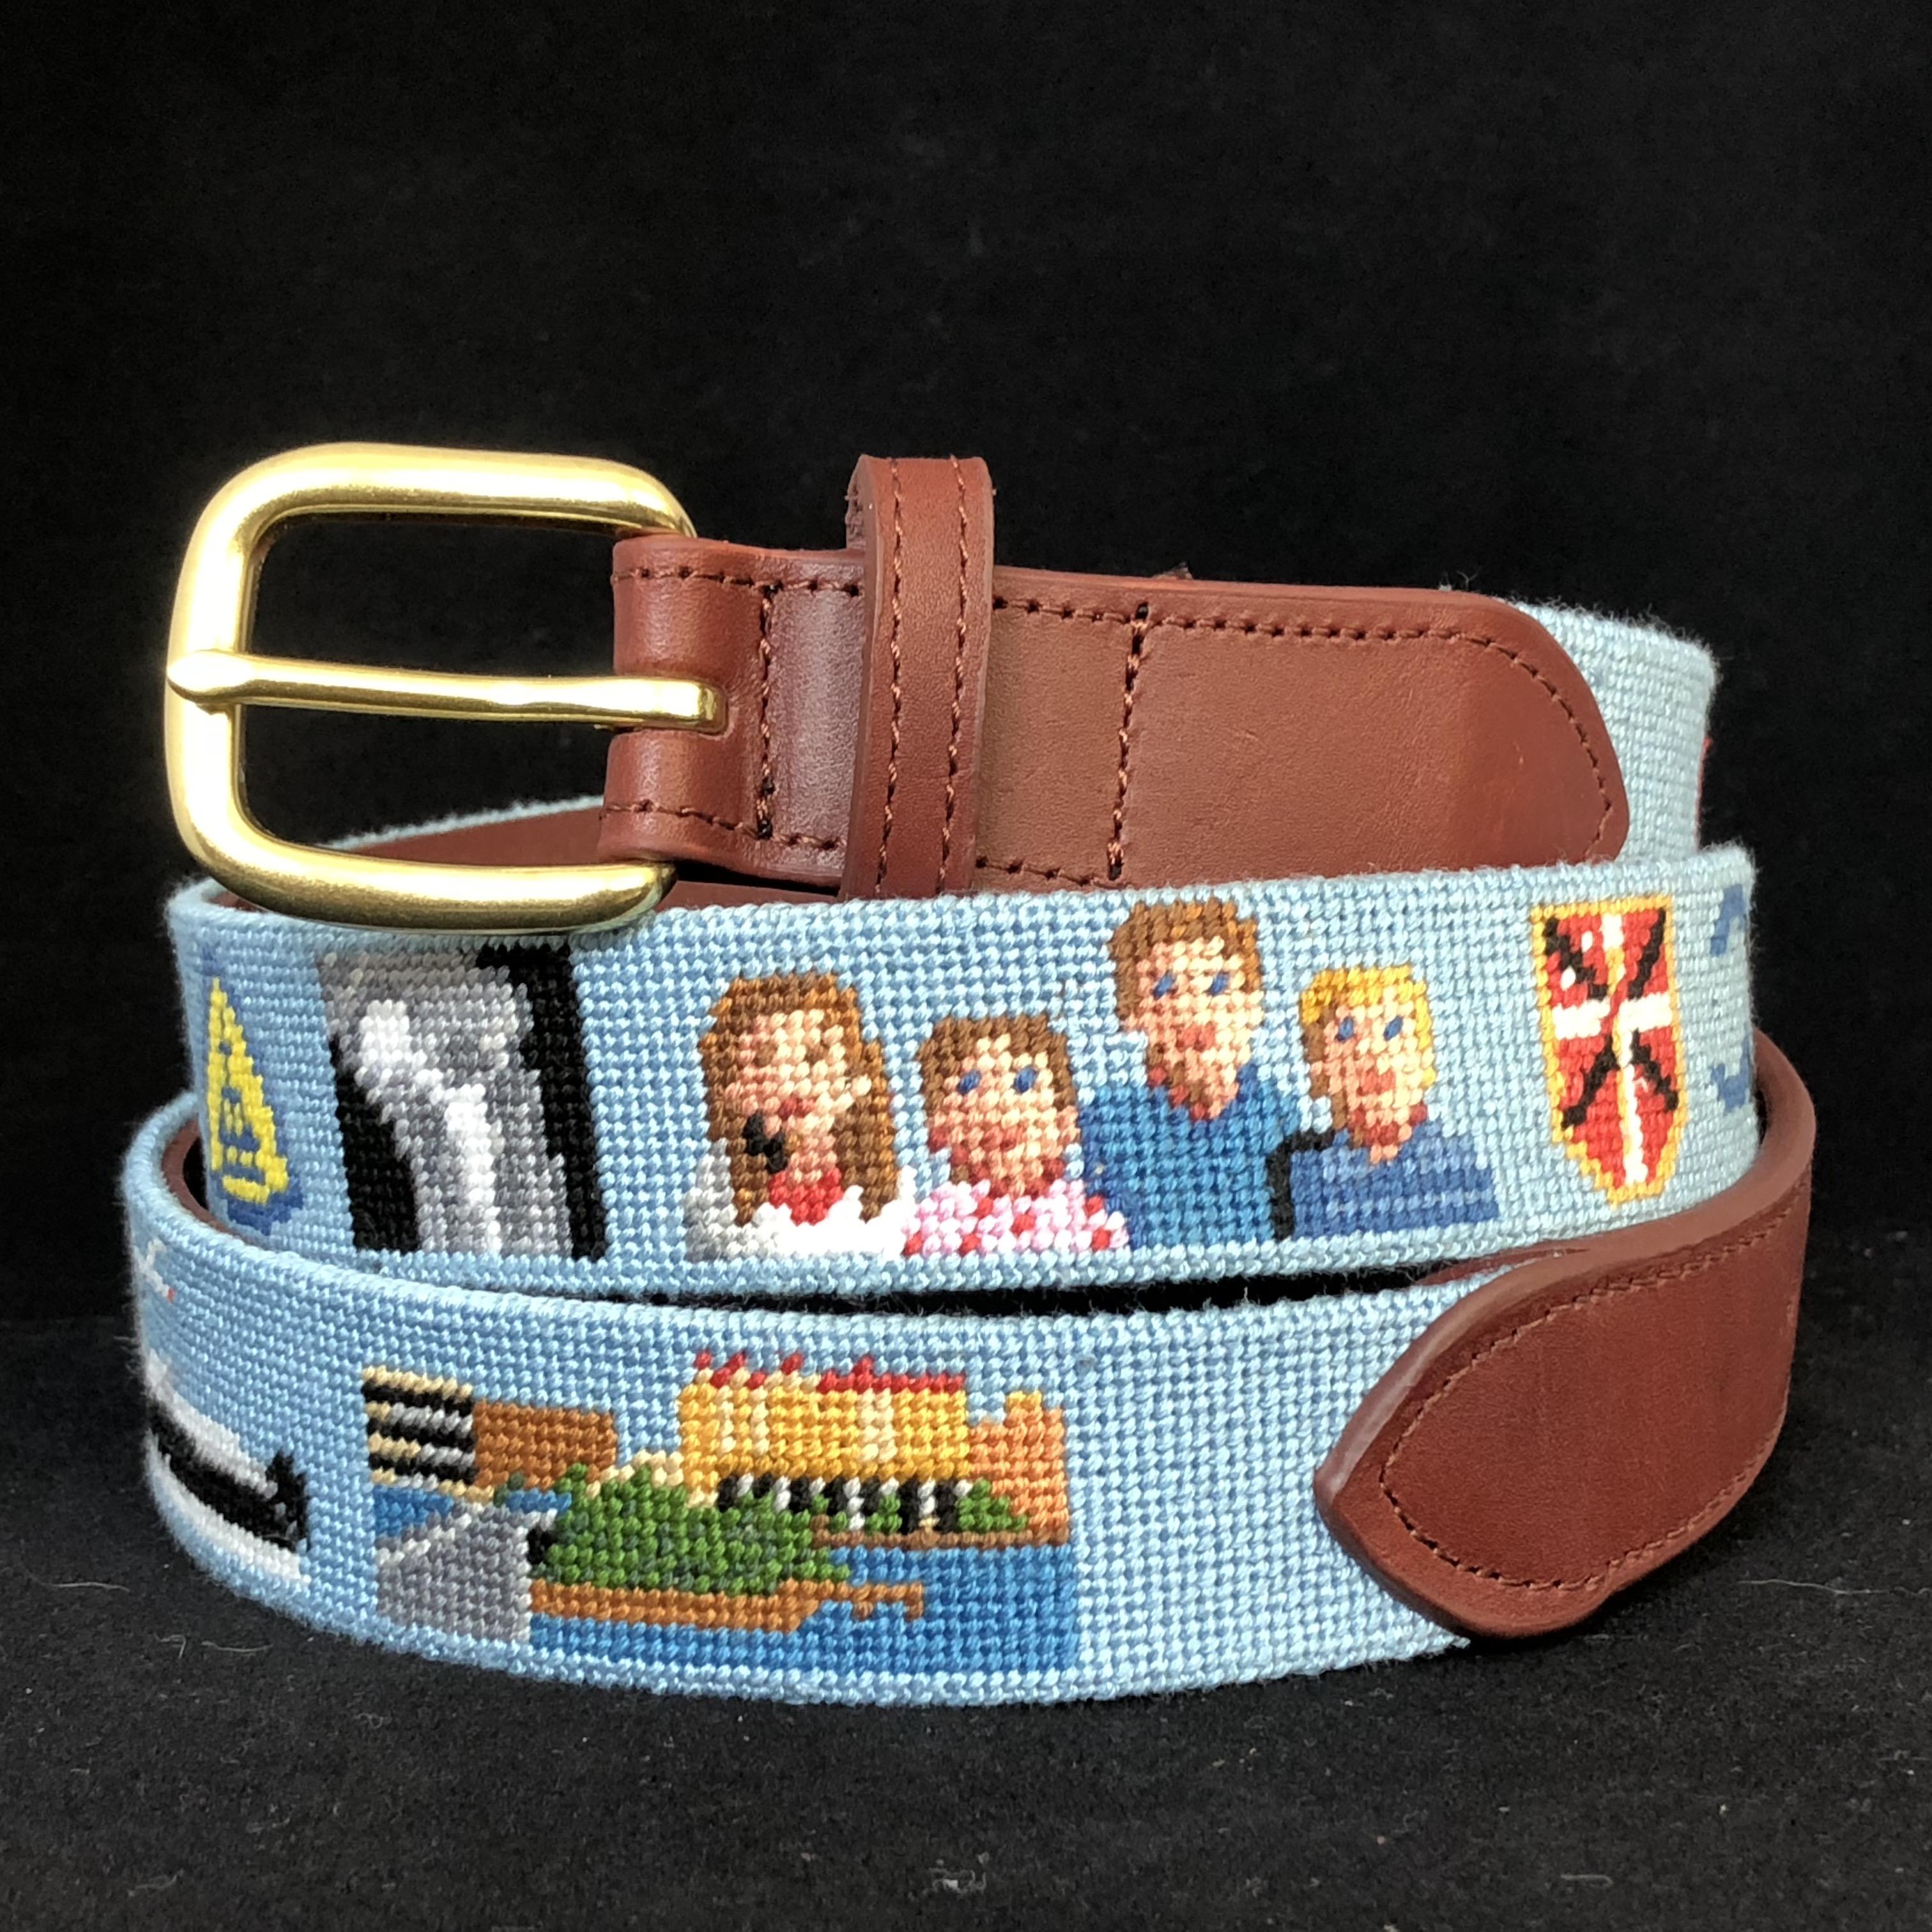 Image of Grandparents Custom Needlepoint Belt Featuring the Grandkids